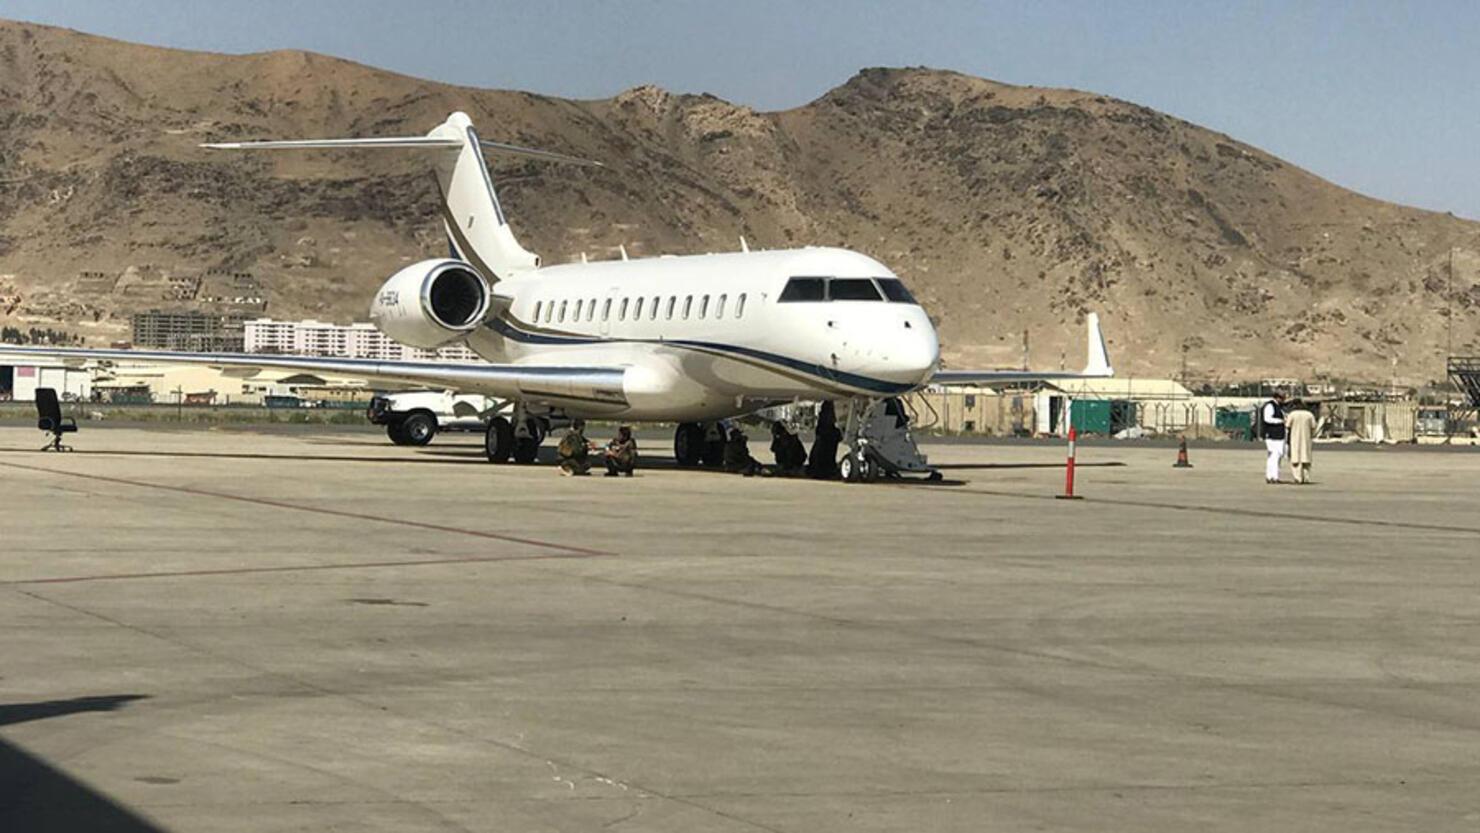 Domestic flights and Pakistani plane at Kabul airport